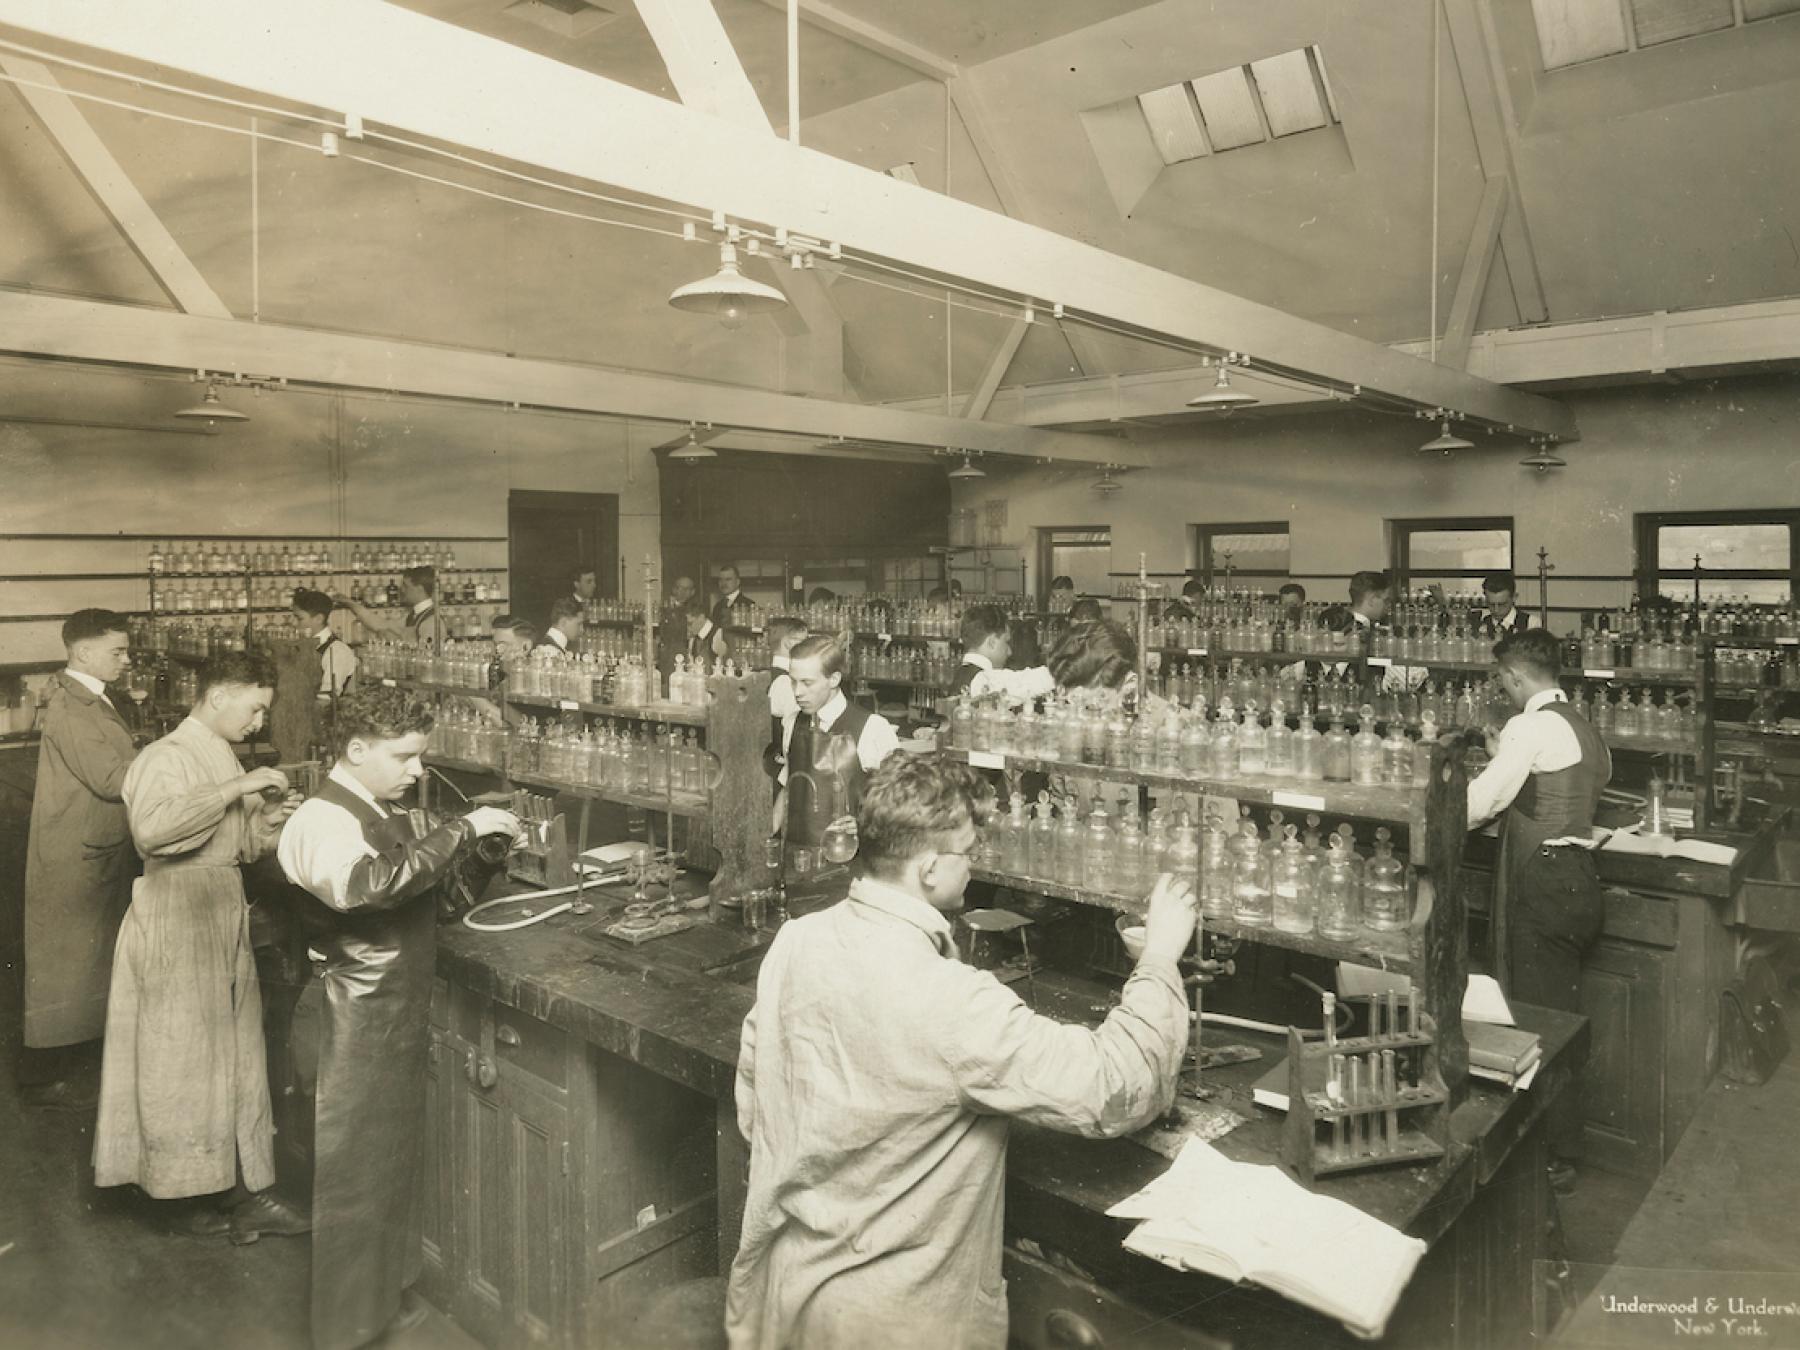 archival photo of chem lab